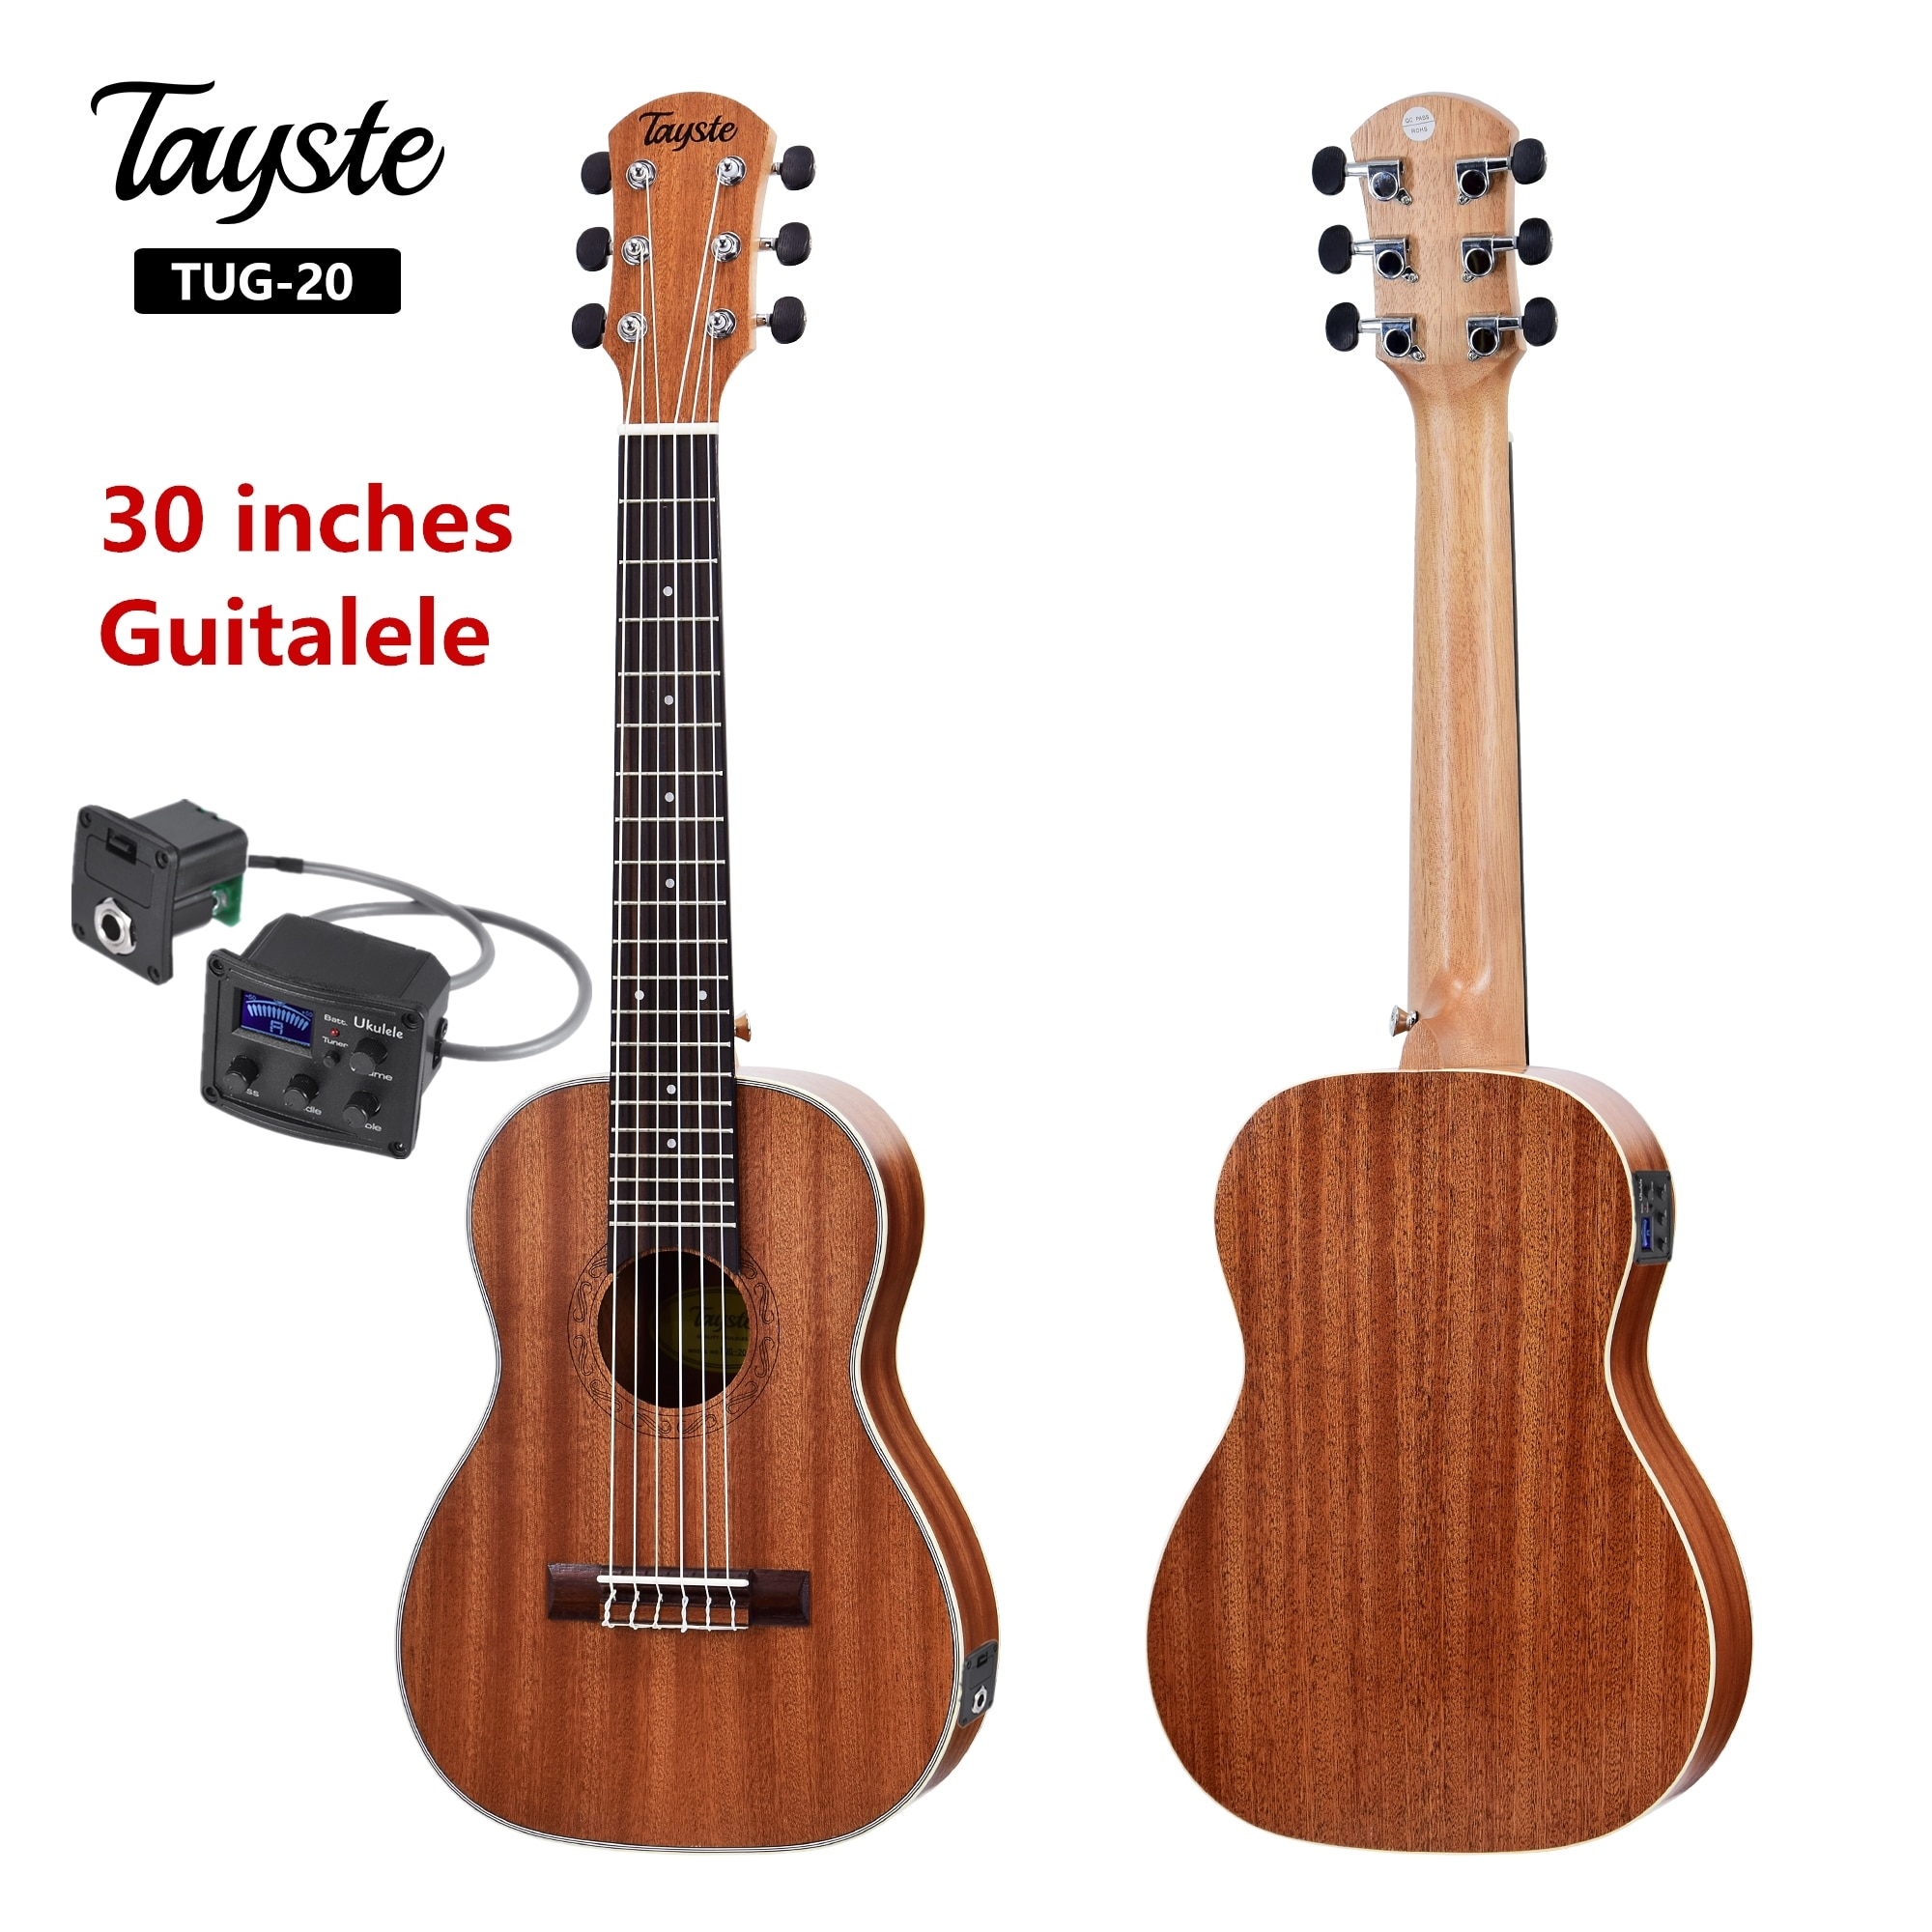 Guitalele Guilele 30 بوصة سبيلي البسيطة الكهربائية Guitarlele الباريتون الصوتية القيثارات 6 سلاسل القيثارة التقاط السفر الغيتار